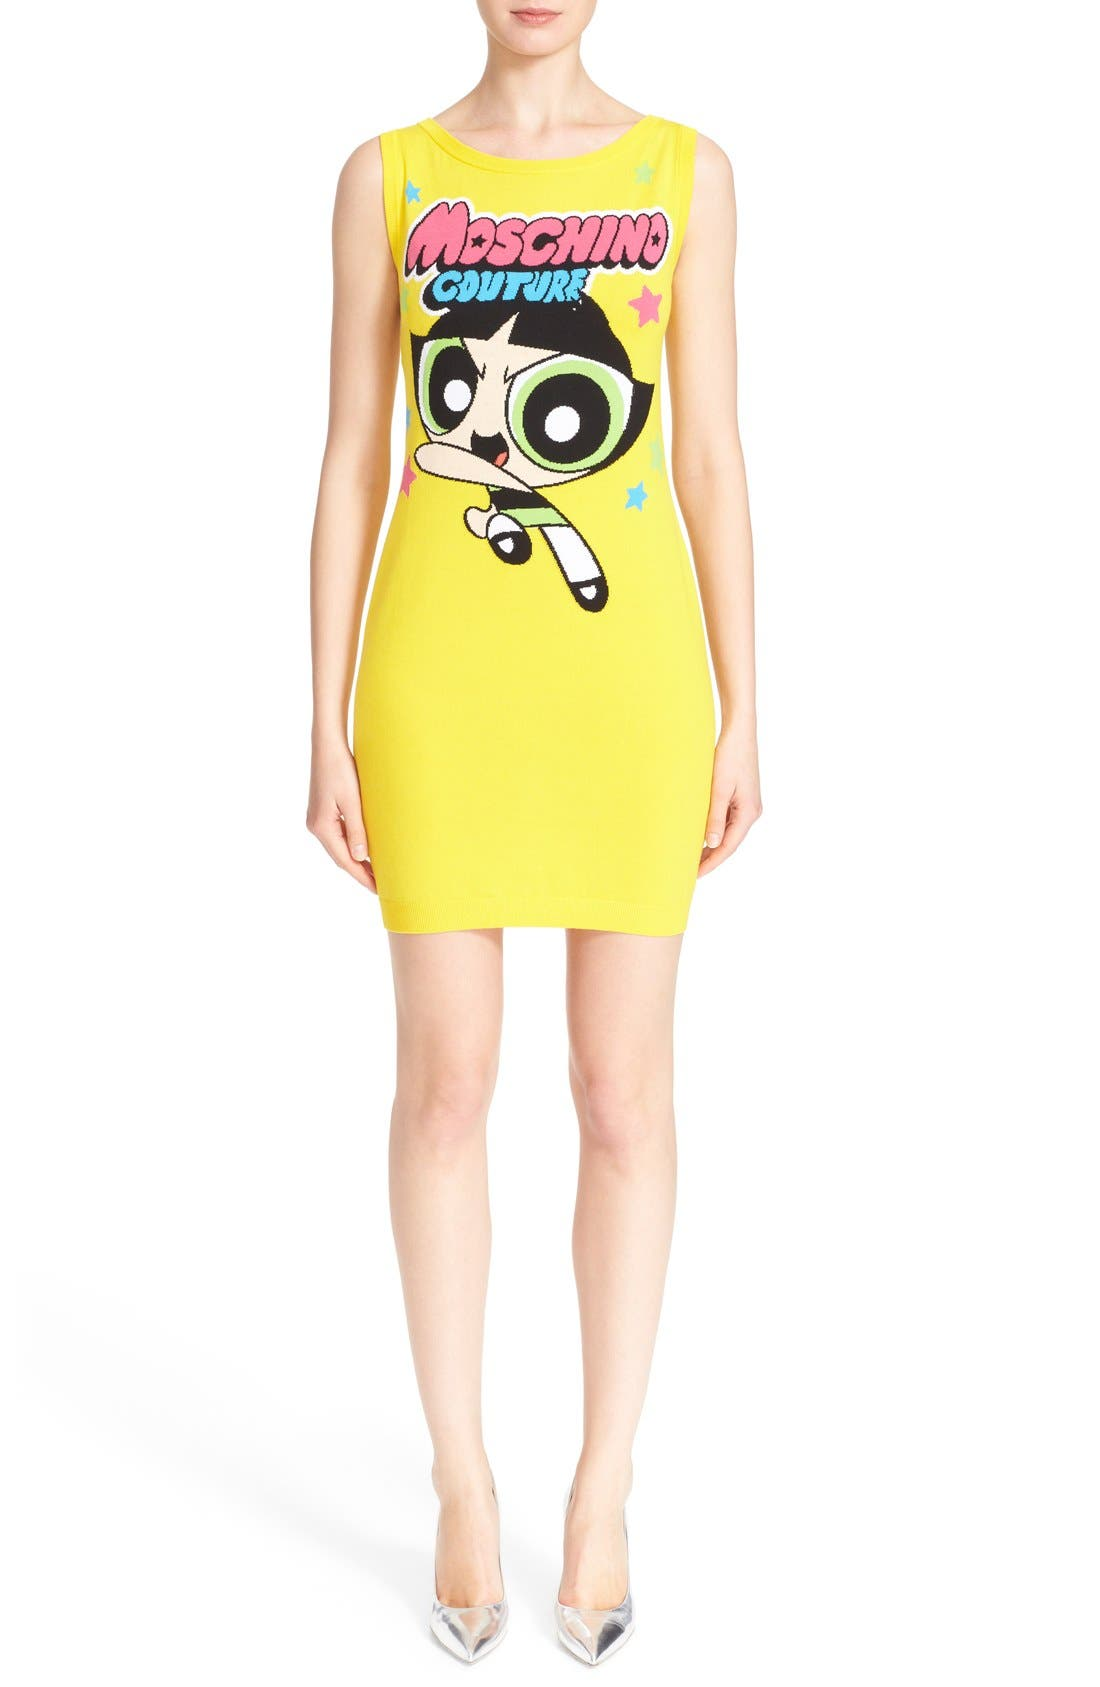 Alternate Image 1 Selected - Moschino 'The Powerpuff Girls® - Buttercup' Intarsia Knit Dress